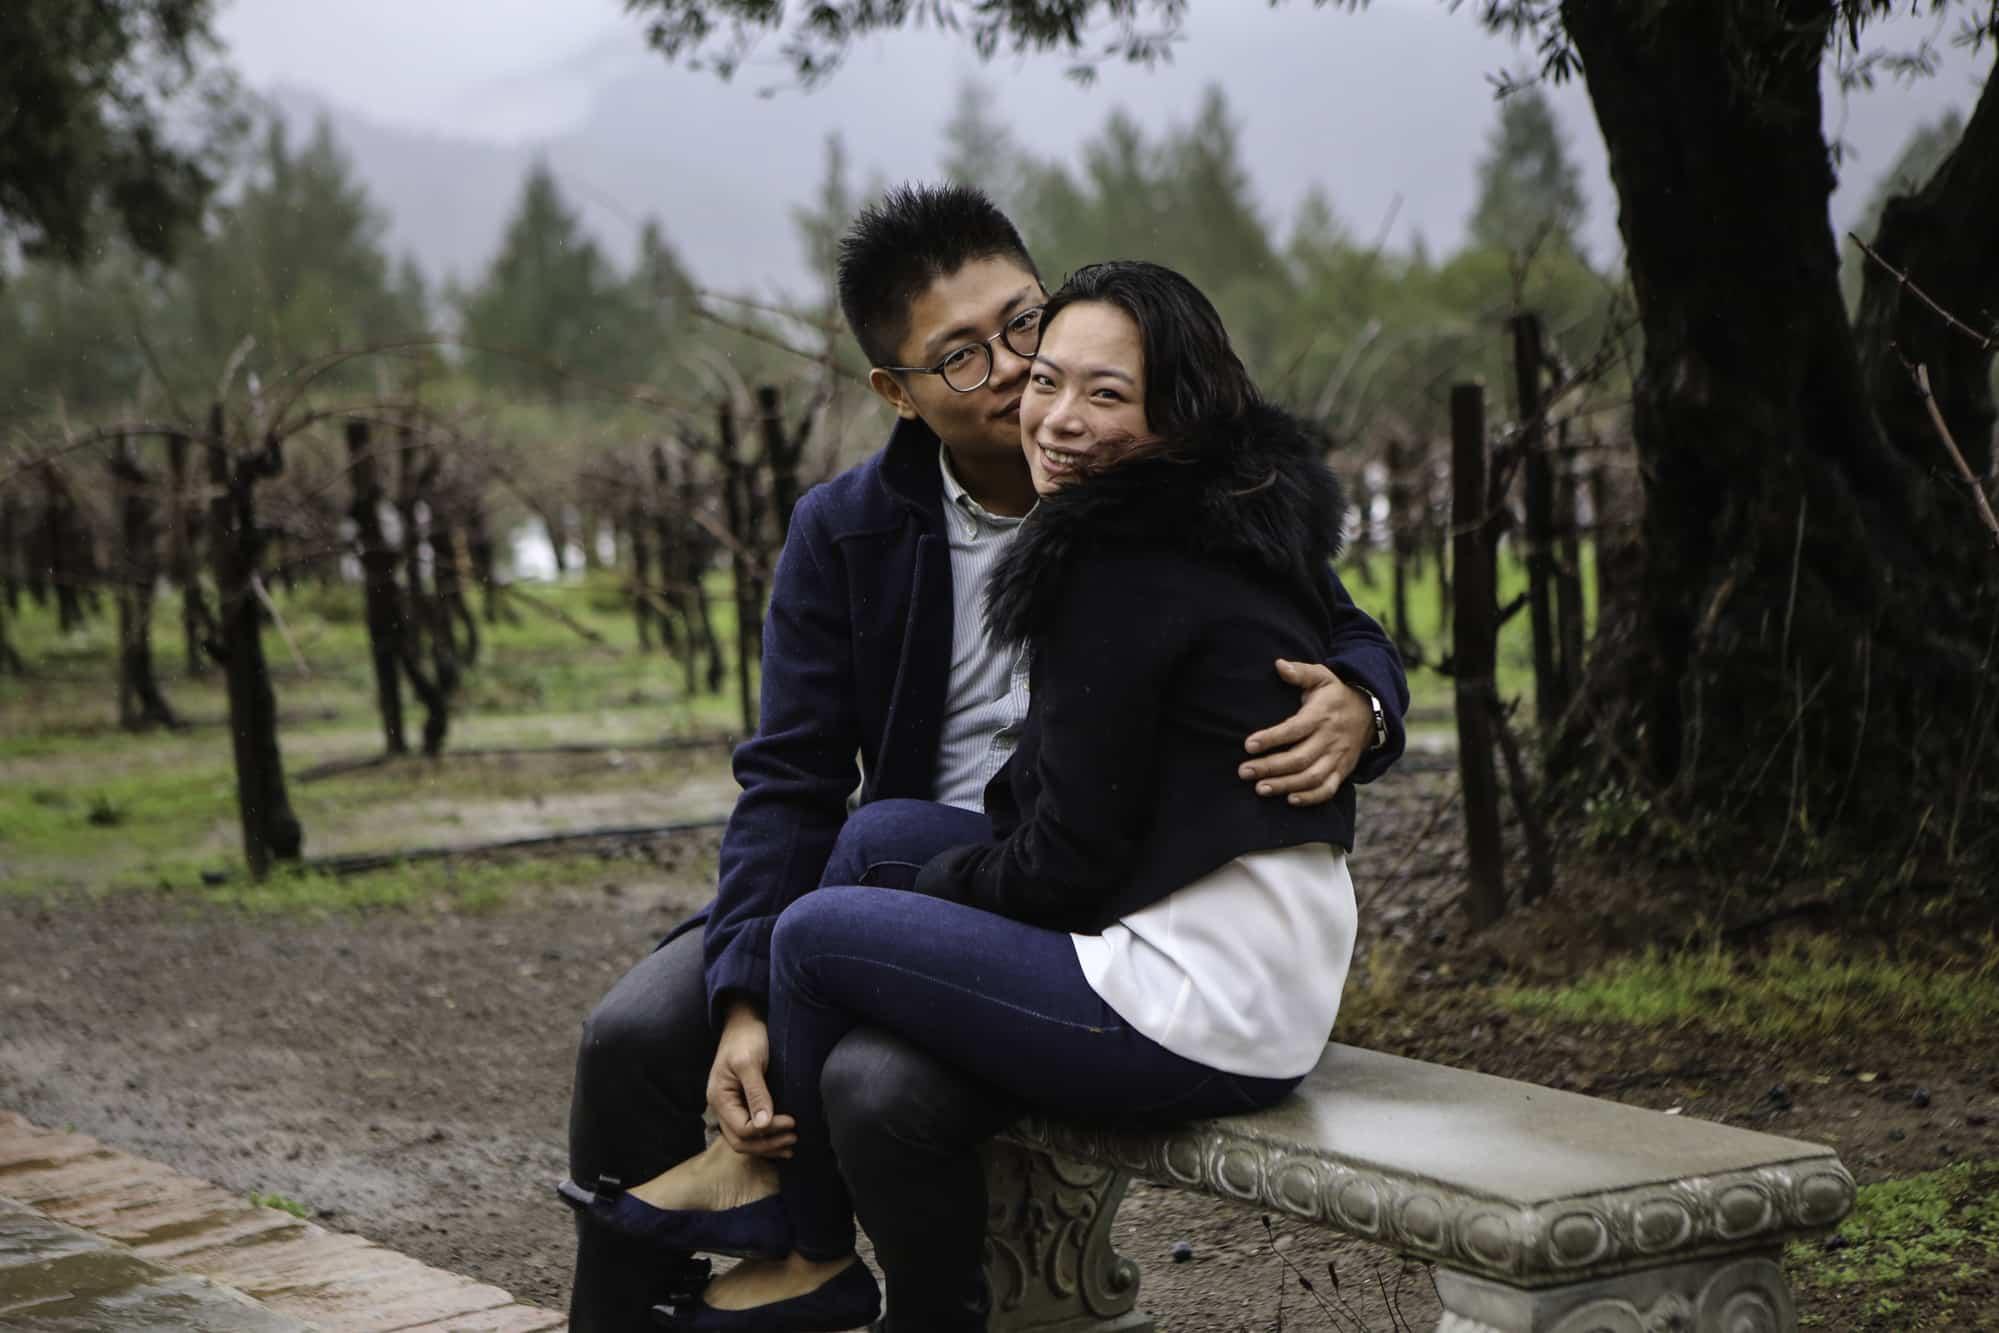 Surprise-Proposal-San-Francisco-Misti-Layne_10